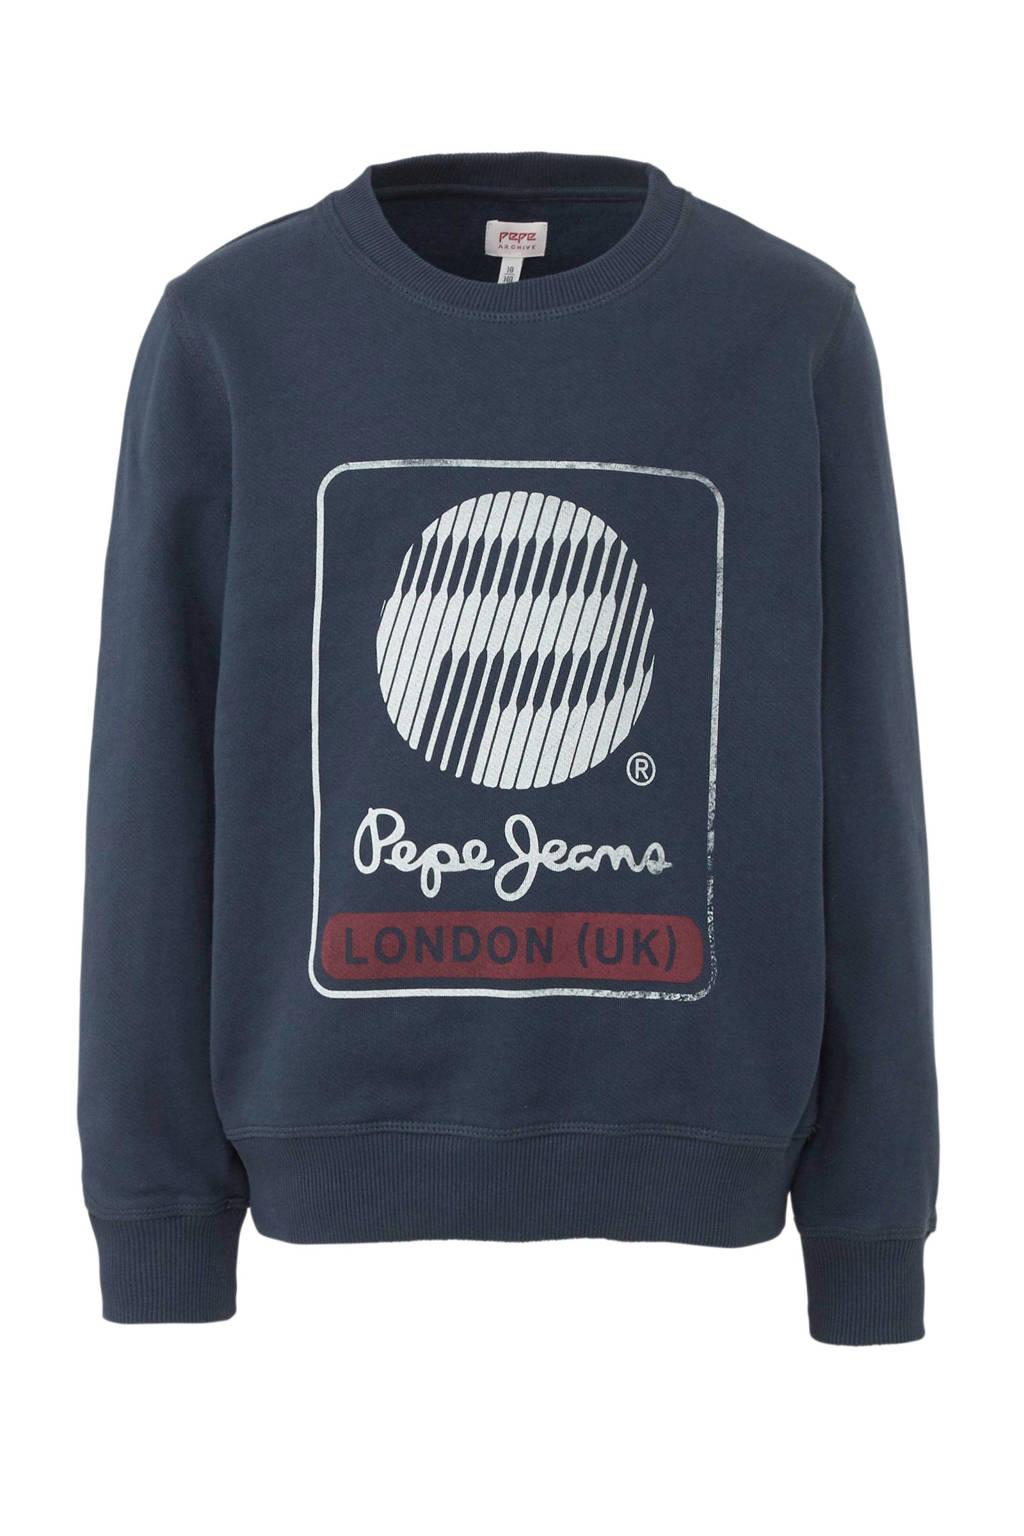 Pepe Jeans sweater Moises met printopdruk donkerblauw, Donkerblauw